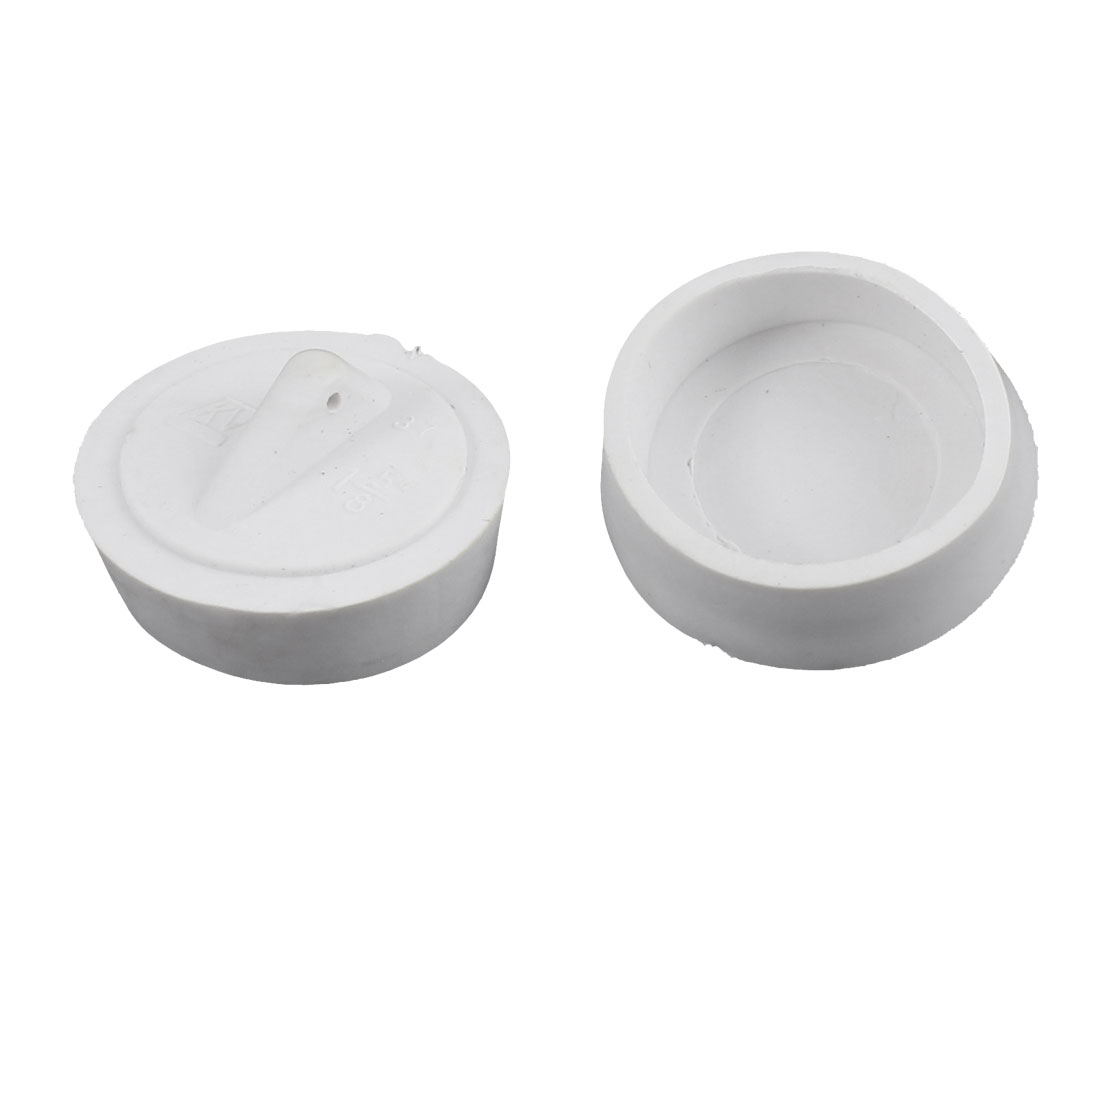 2Pcs Rubber Drain Stopper Bathtub Basin Sink Stopper Waste White